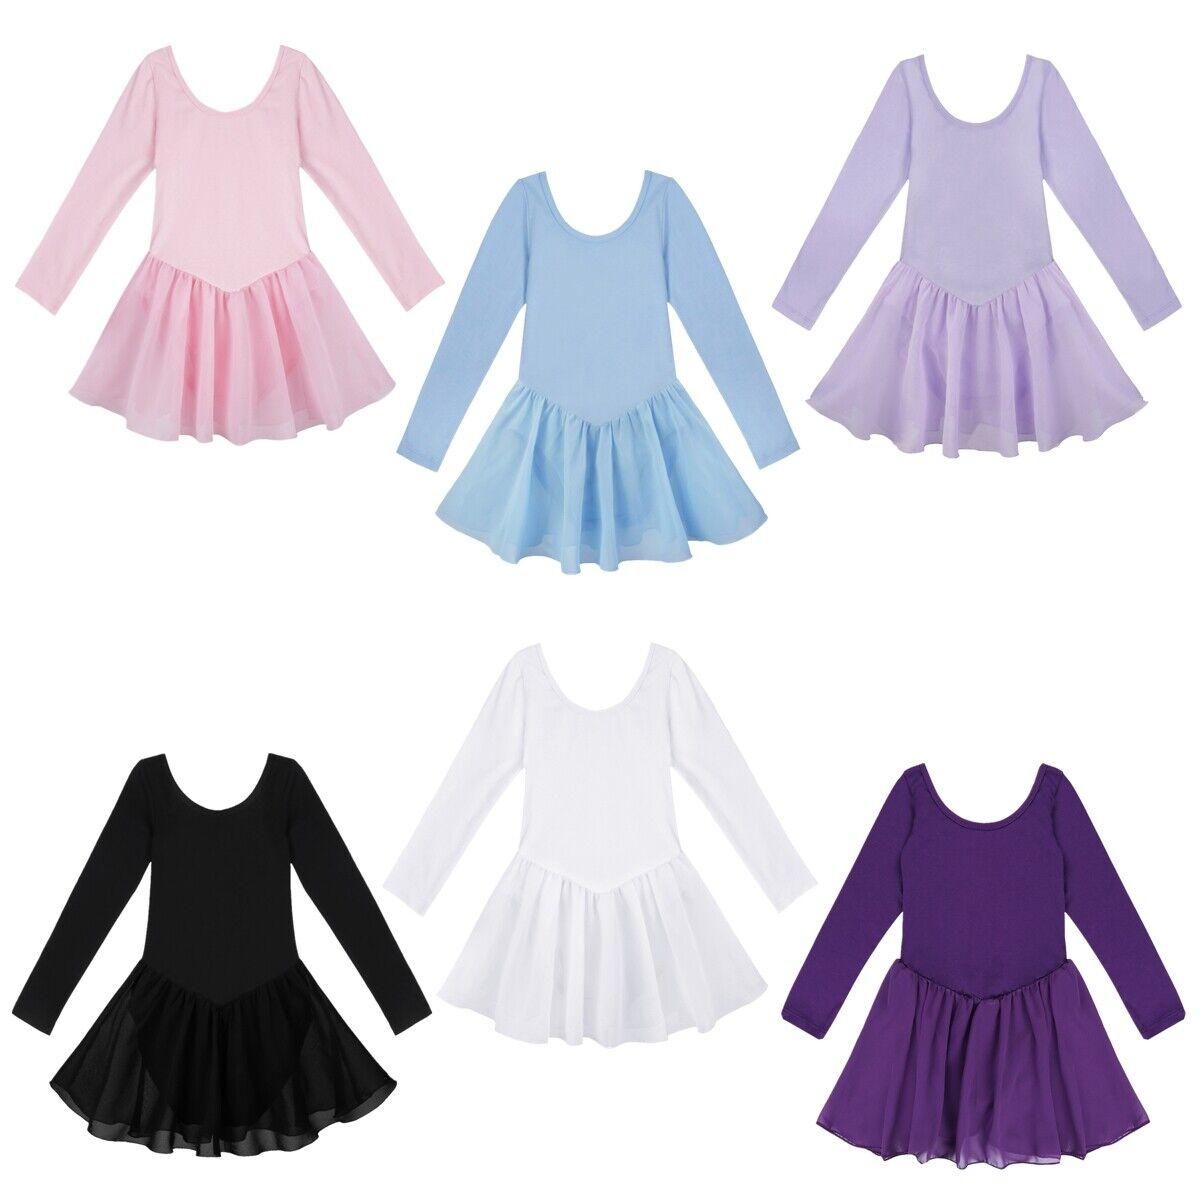 UK Kids Girls Ballet Dance Leotards Dress Bodysuit Gymnastics Jumpsuit Dancewear